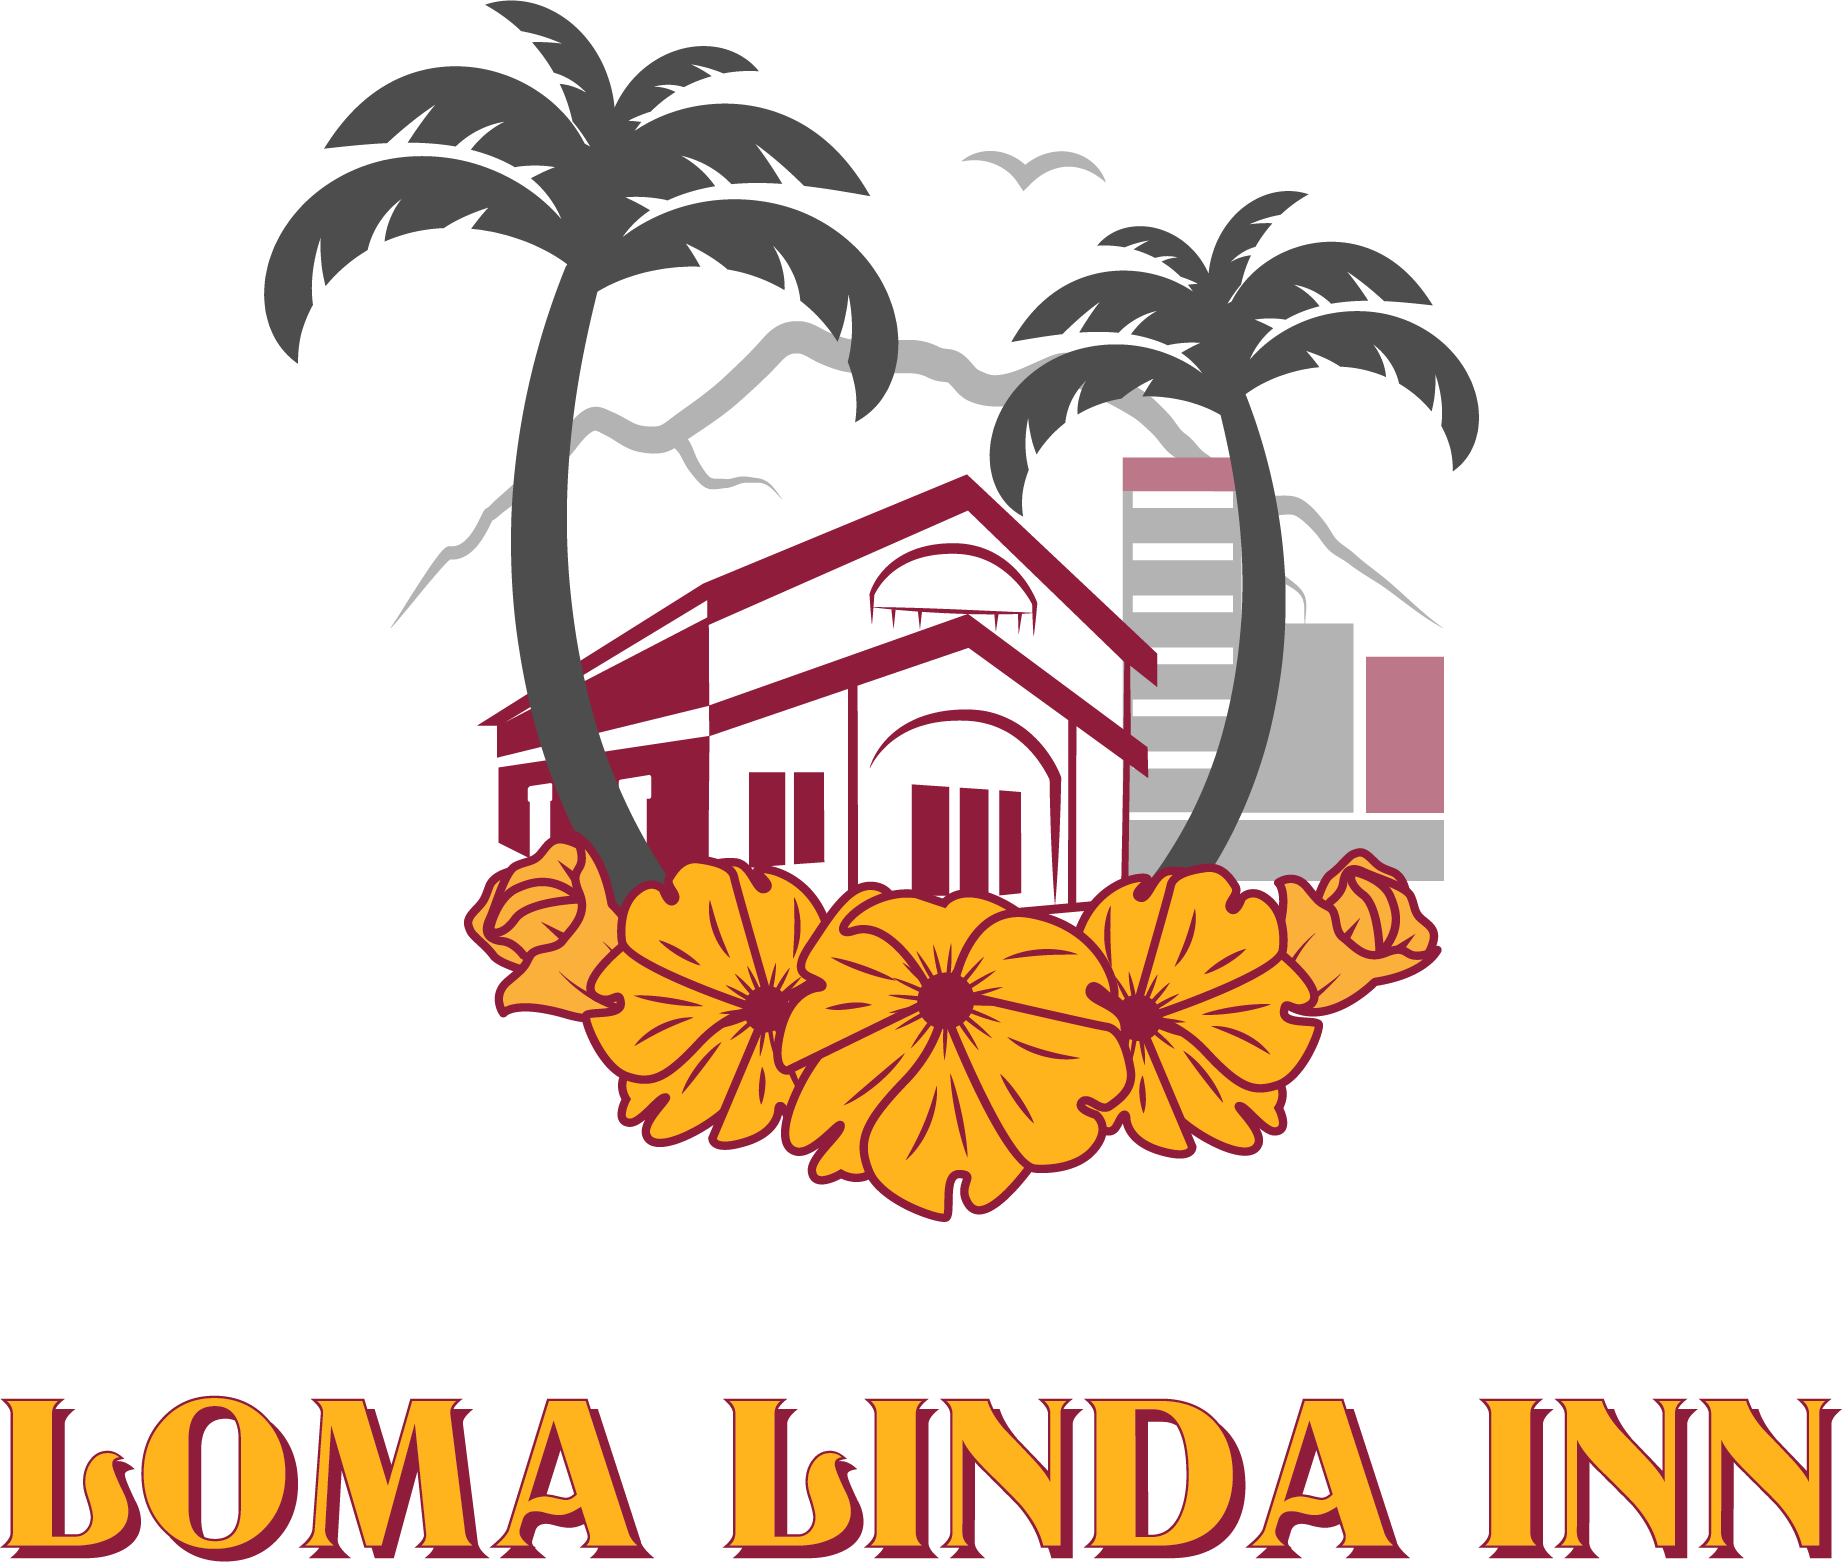 Loma Linda Inn